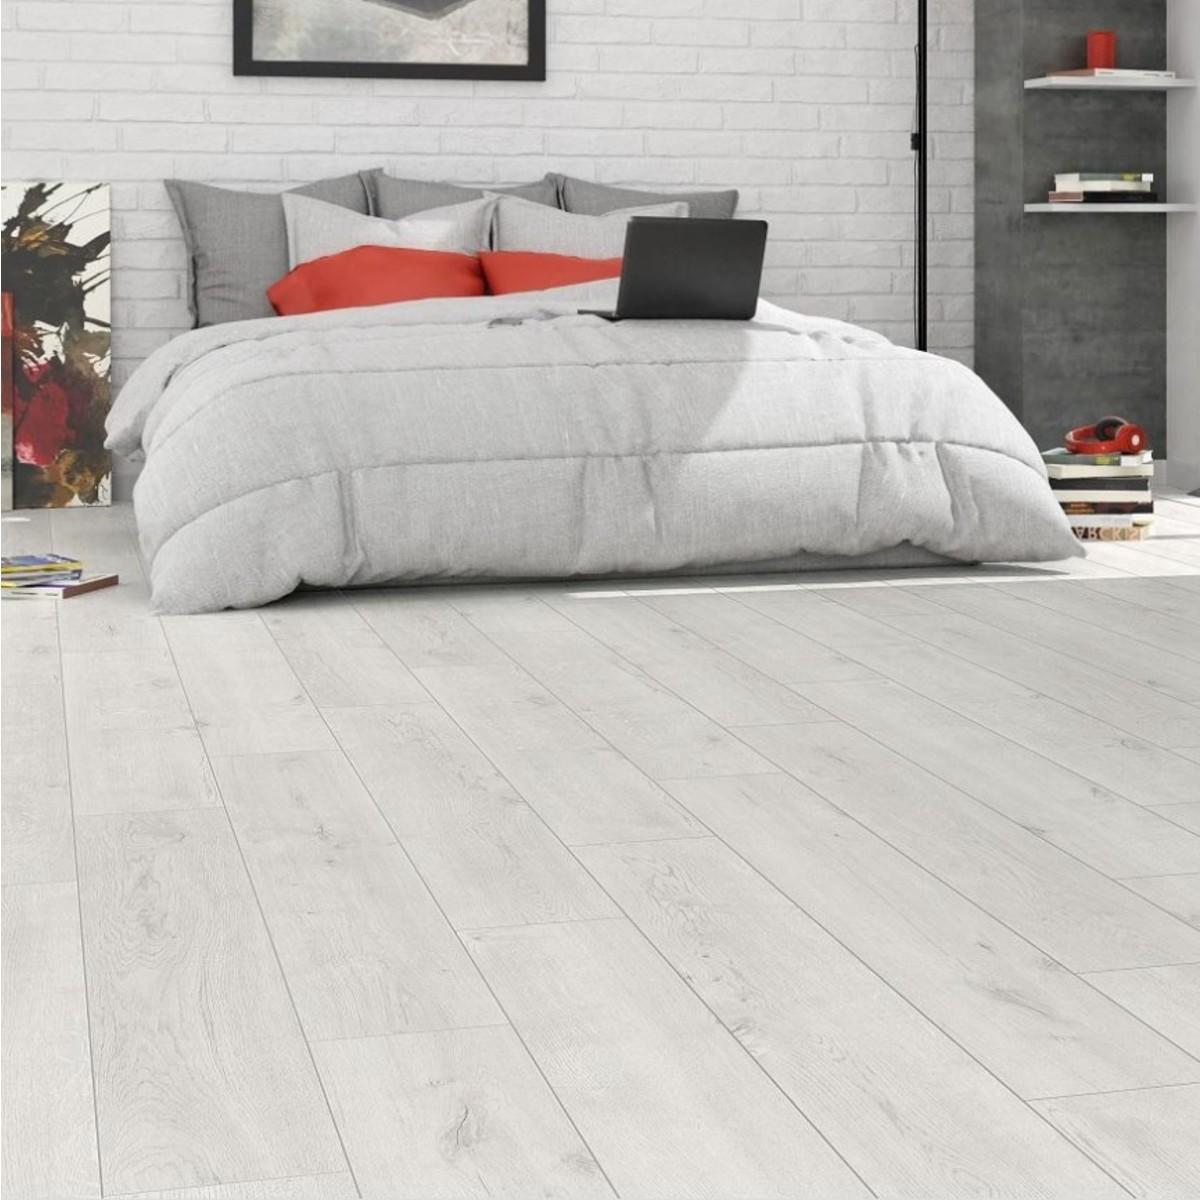 Ламинат Camsan Platinum 32 класс толщина 10 мм 1.84 м²